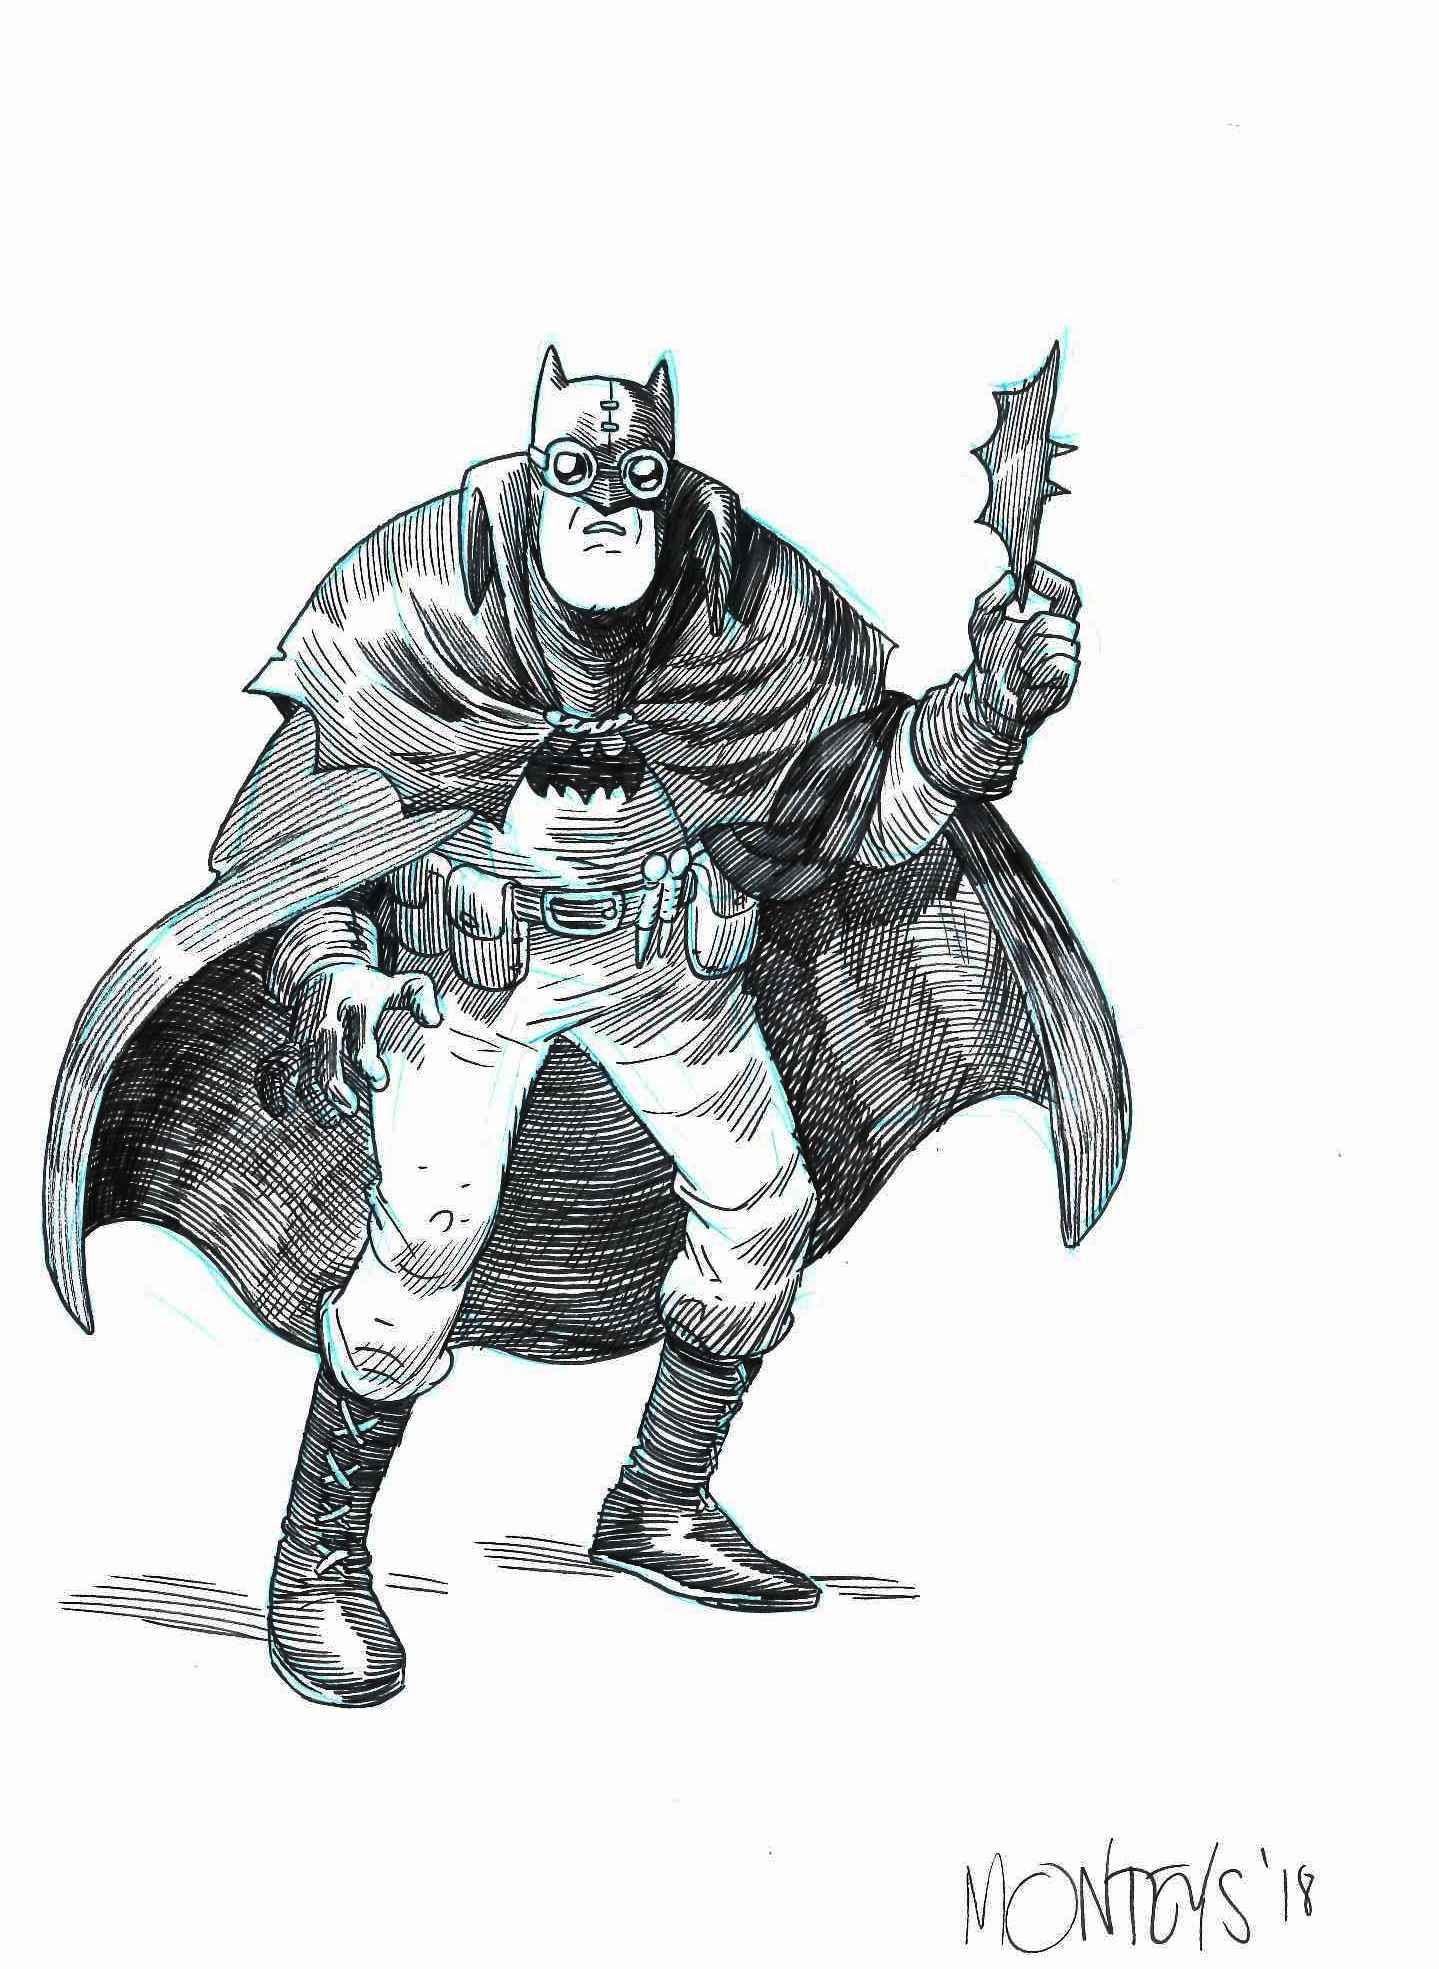 Batman Gotham By Gaslight Or Something Like That In Erfauki D S For Sale Miscelanea Comic Art Gallery Room